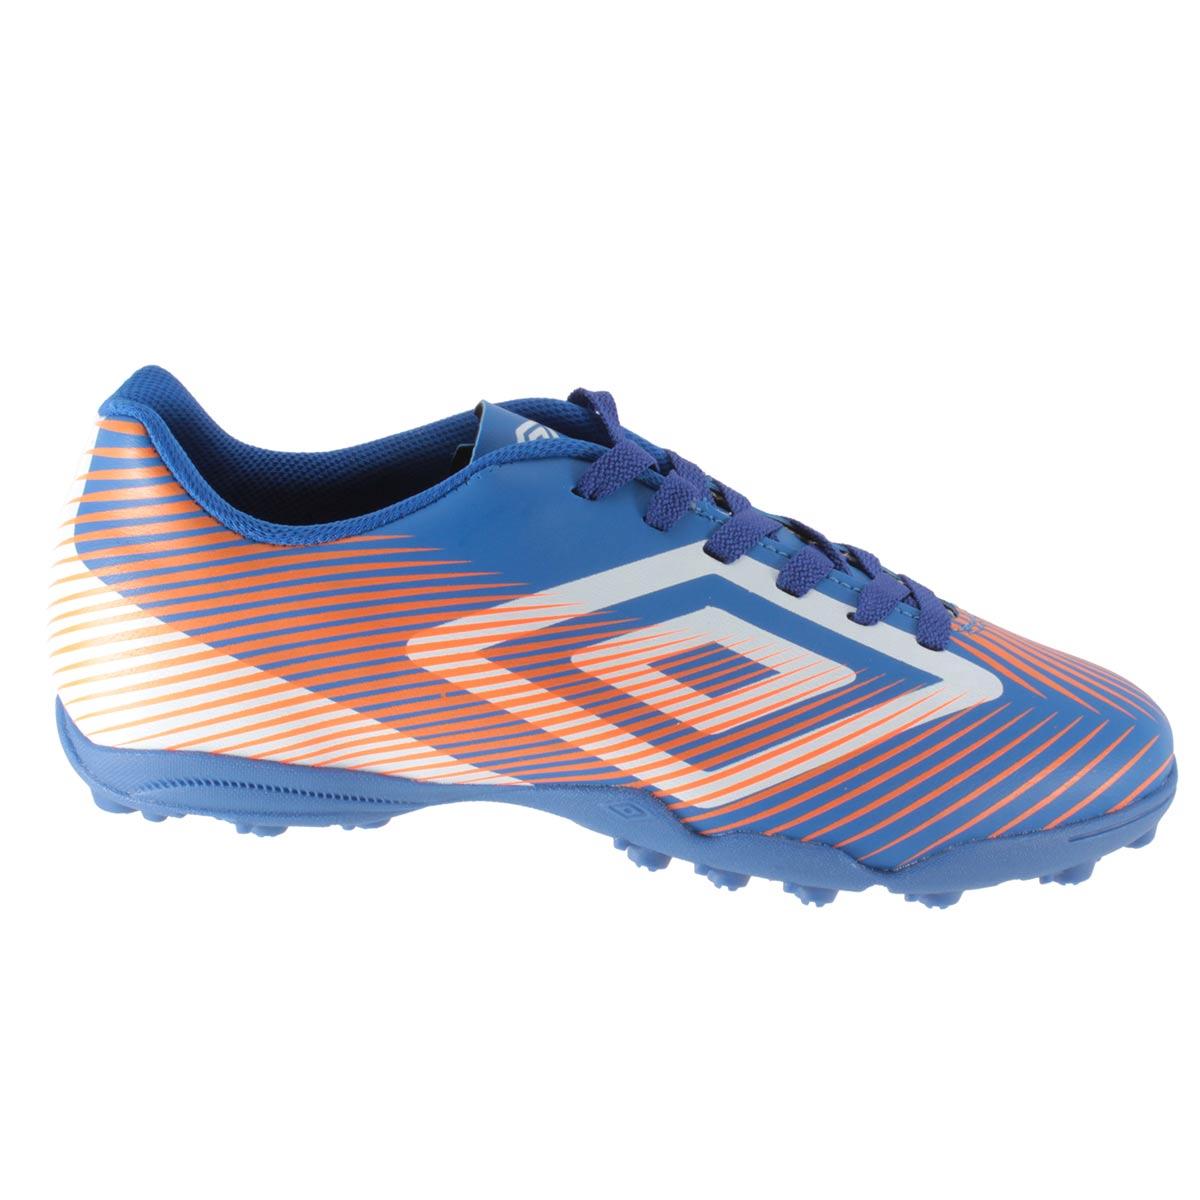 Chuteira Umbro Speed 2 Futebol Society 0F71041  - Ian Calçados